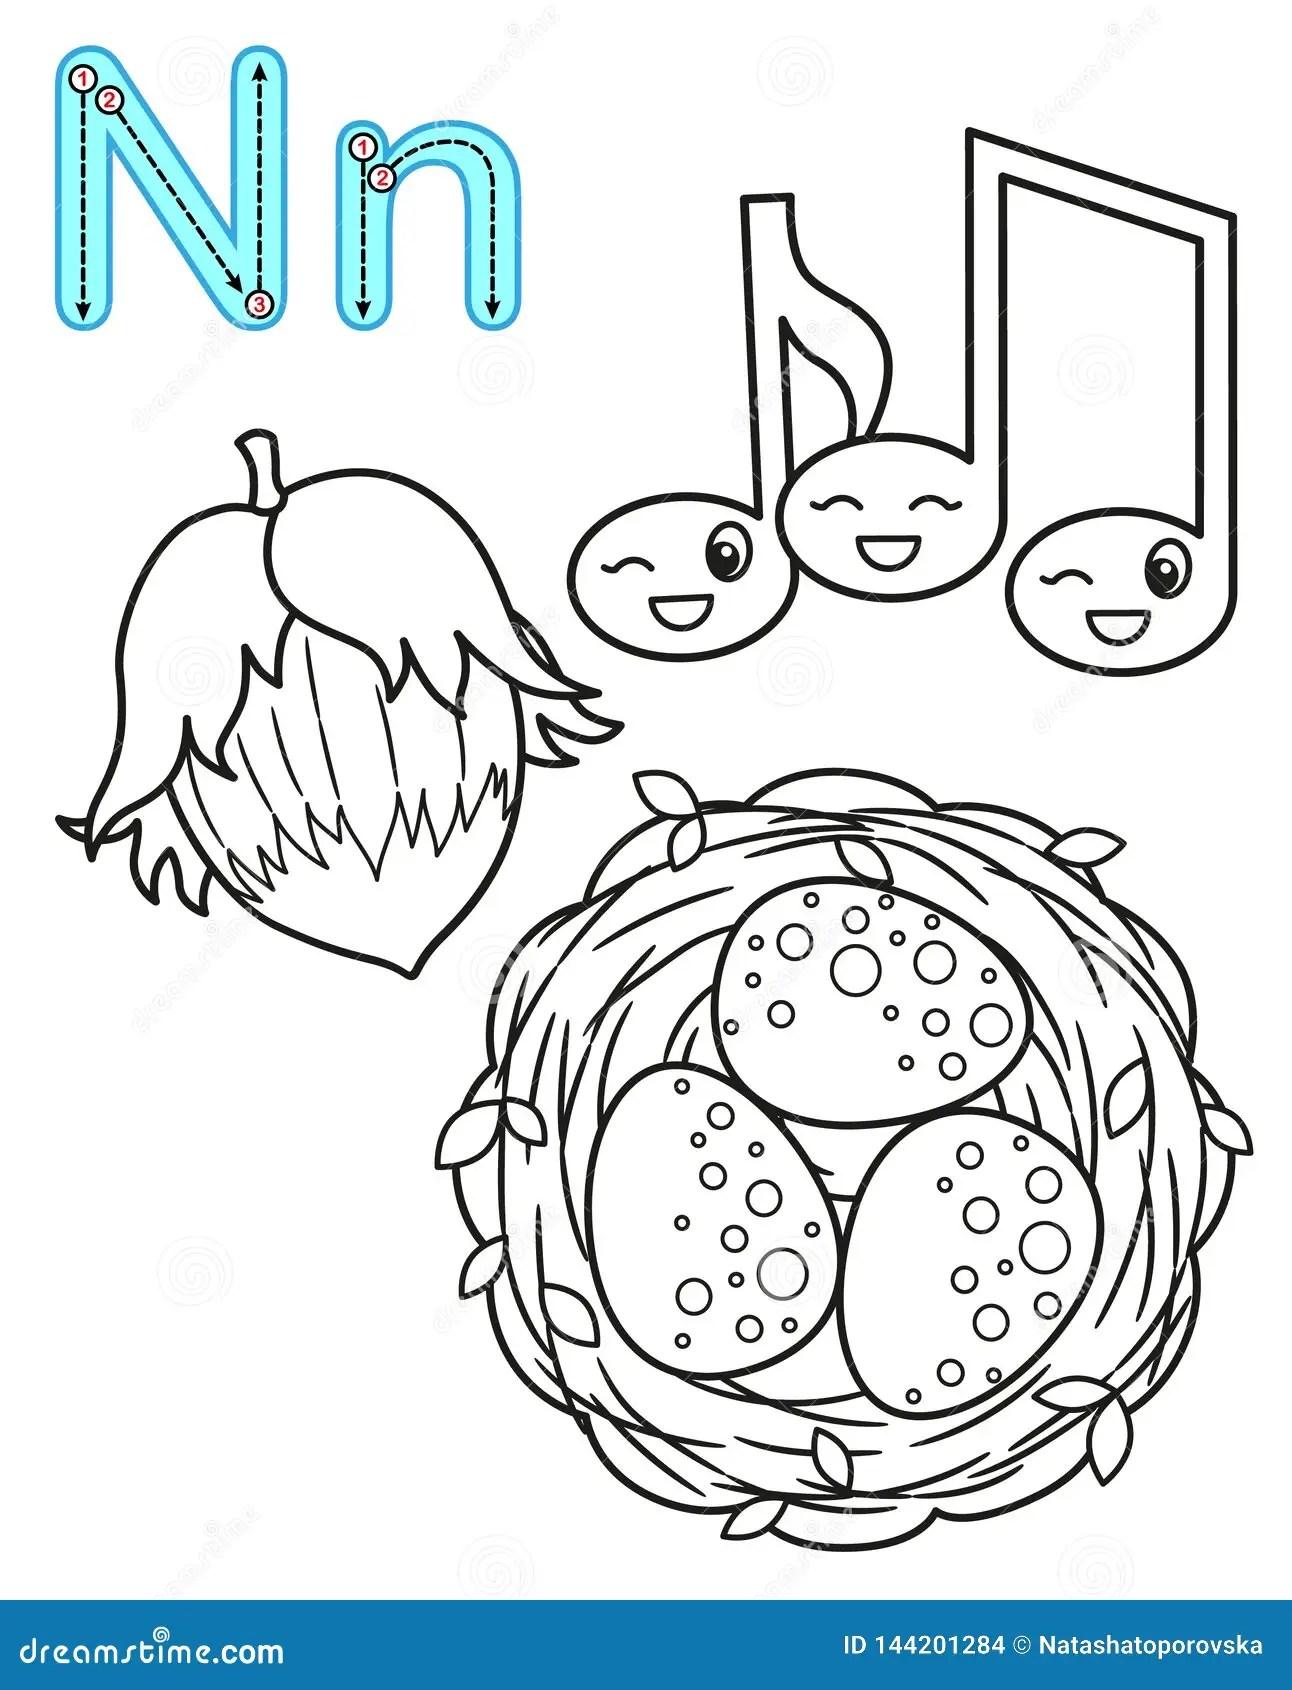 Printable Coloring Page For Kindergarten And Preschool